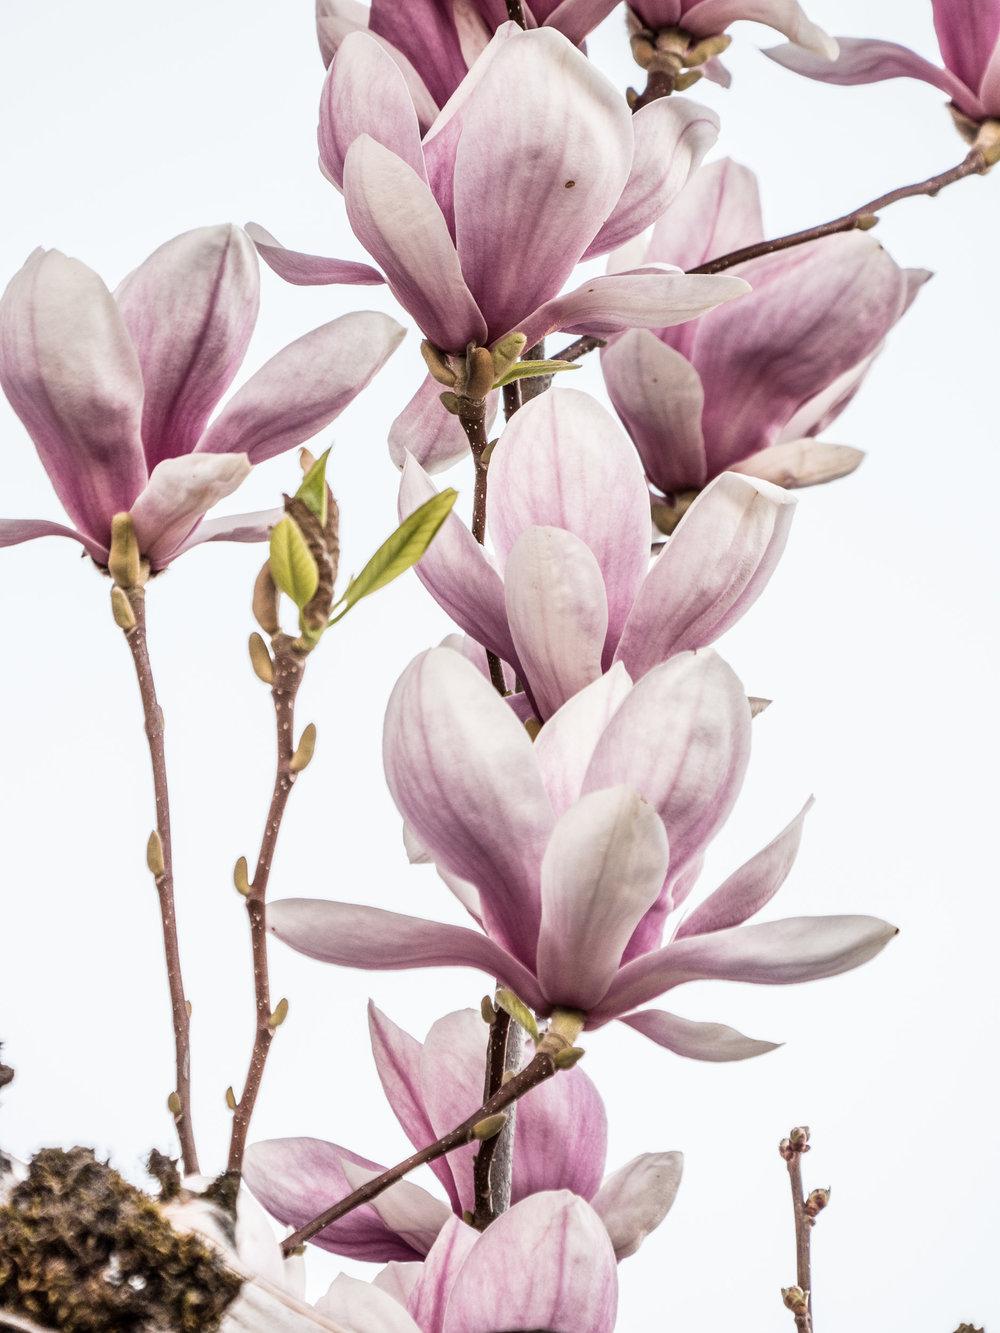 20170330_panasonic_gh5_magnolien_1004746.jpg